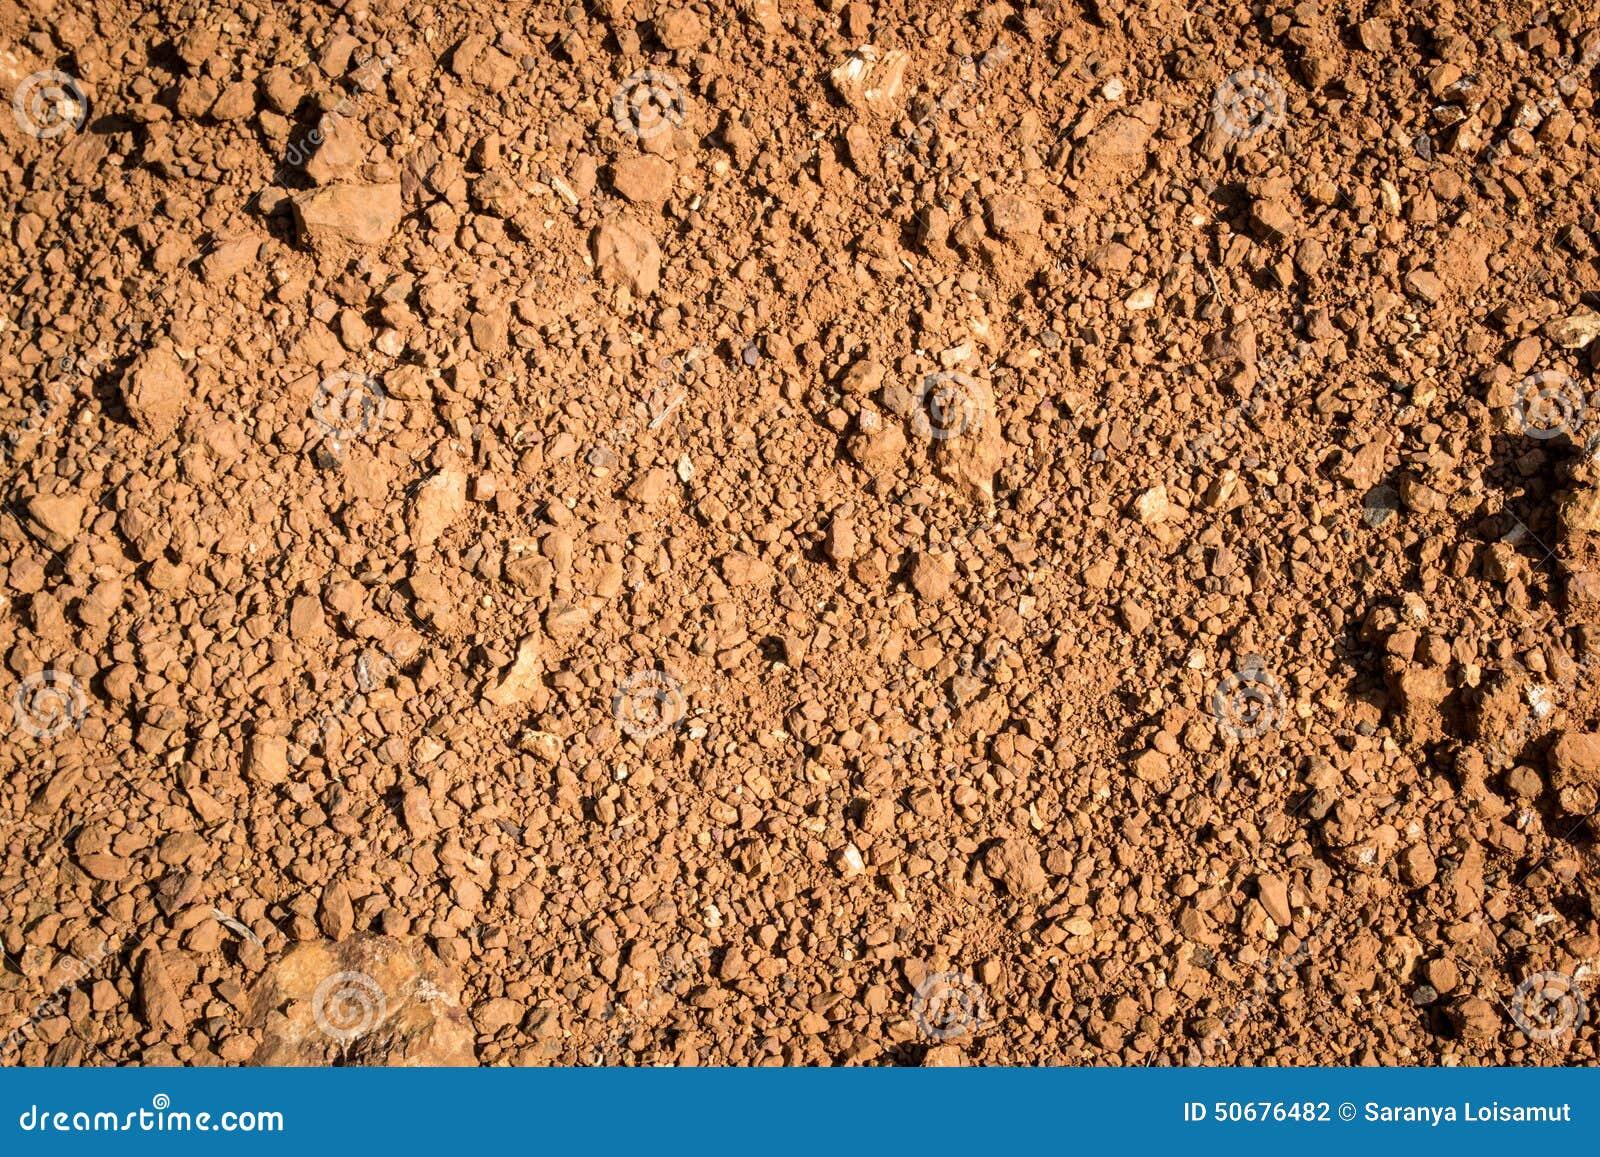 Download 红土带土壤 库存照片. 图片 包括有 陆运, 黏土, 小卵石, 较少, 庄稼, 岩石, 天旱, 含铬, browne - 50676482